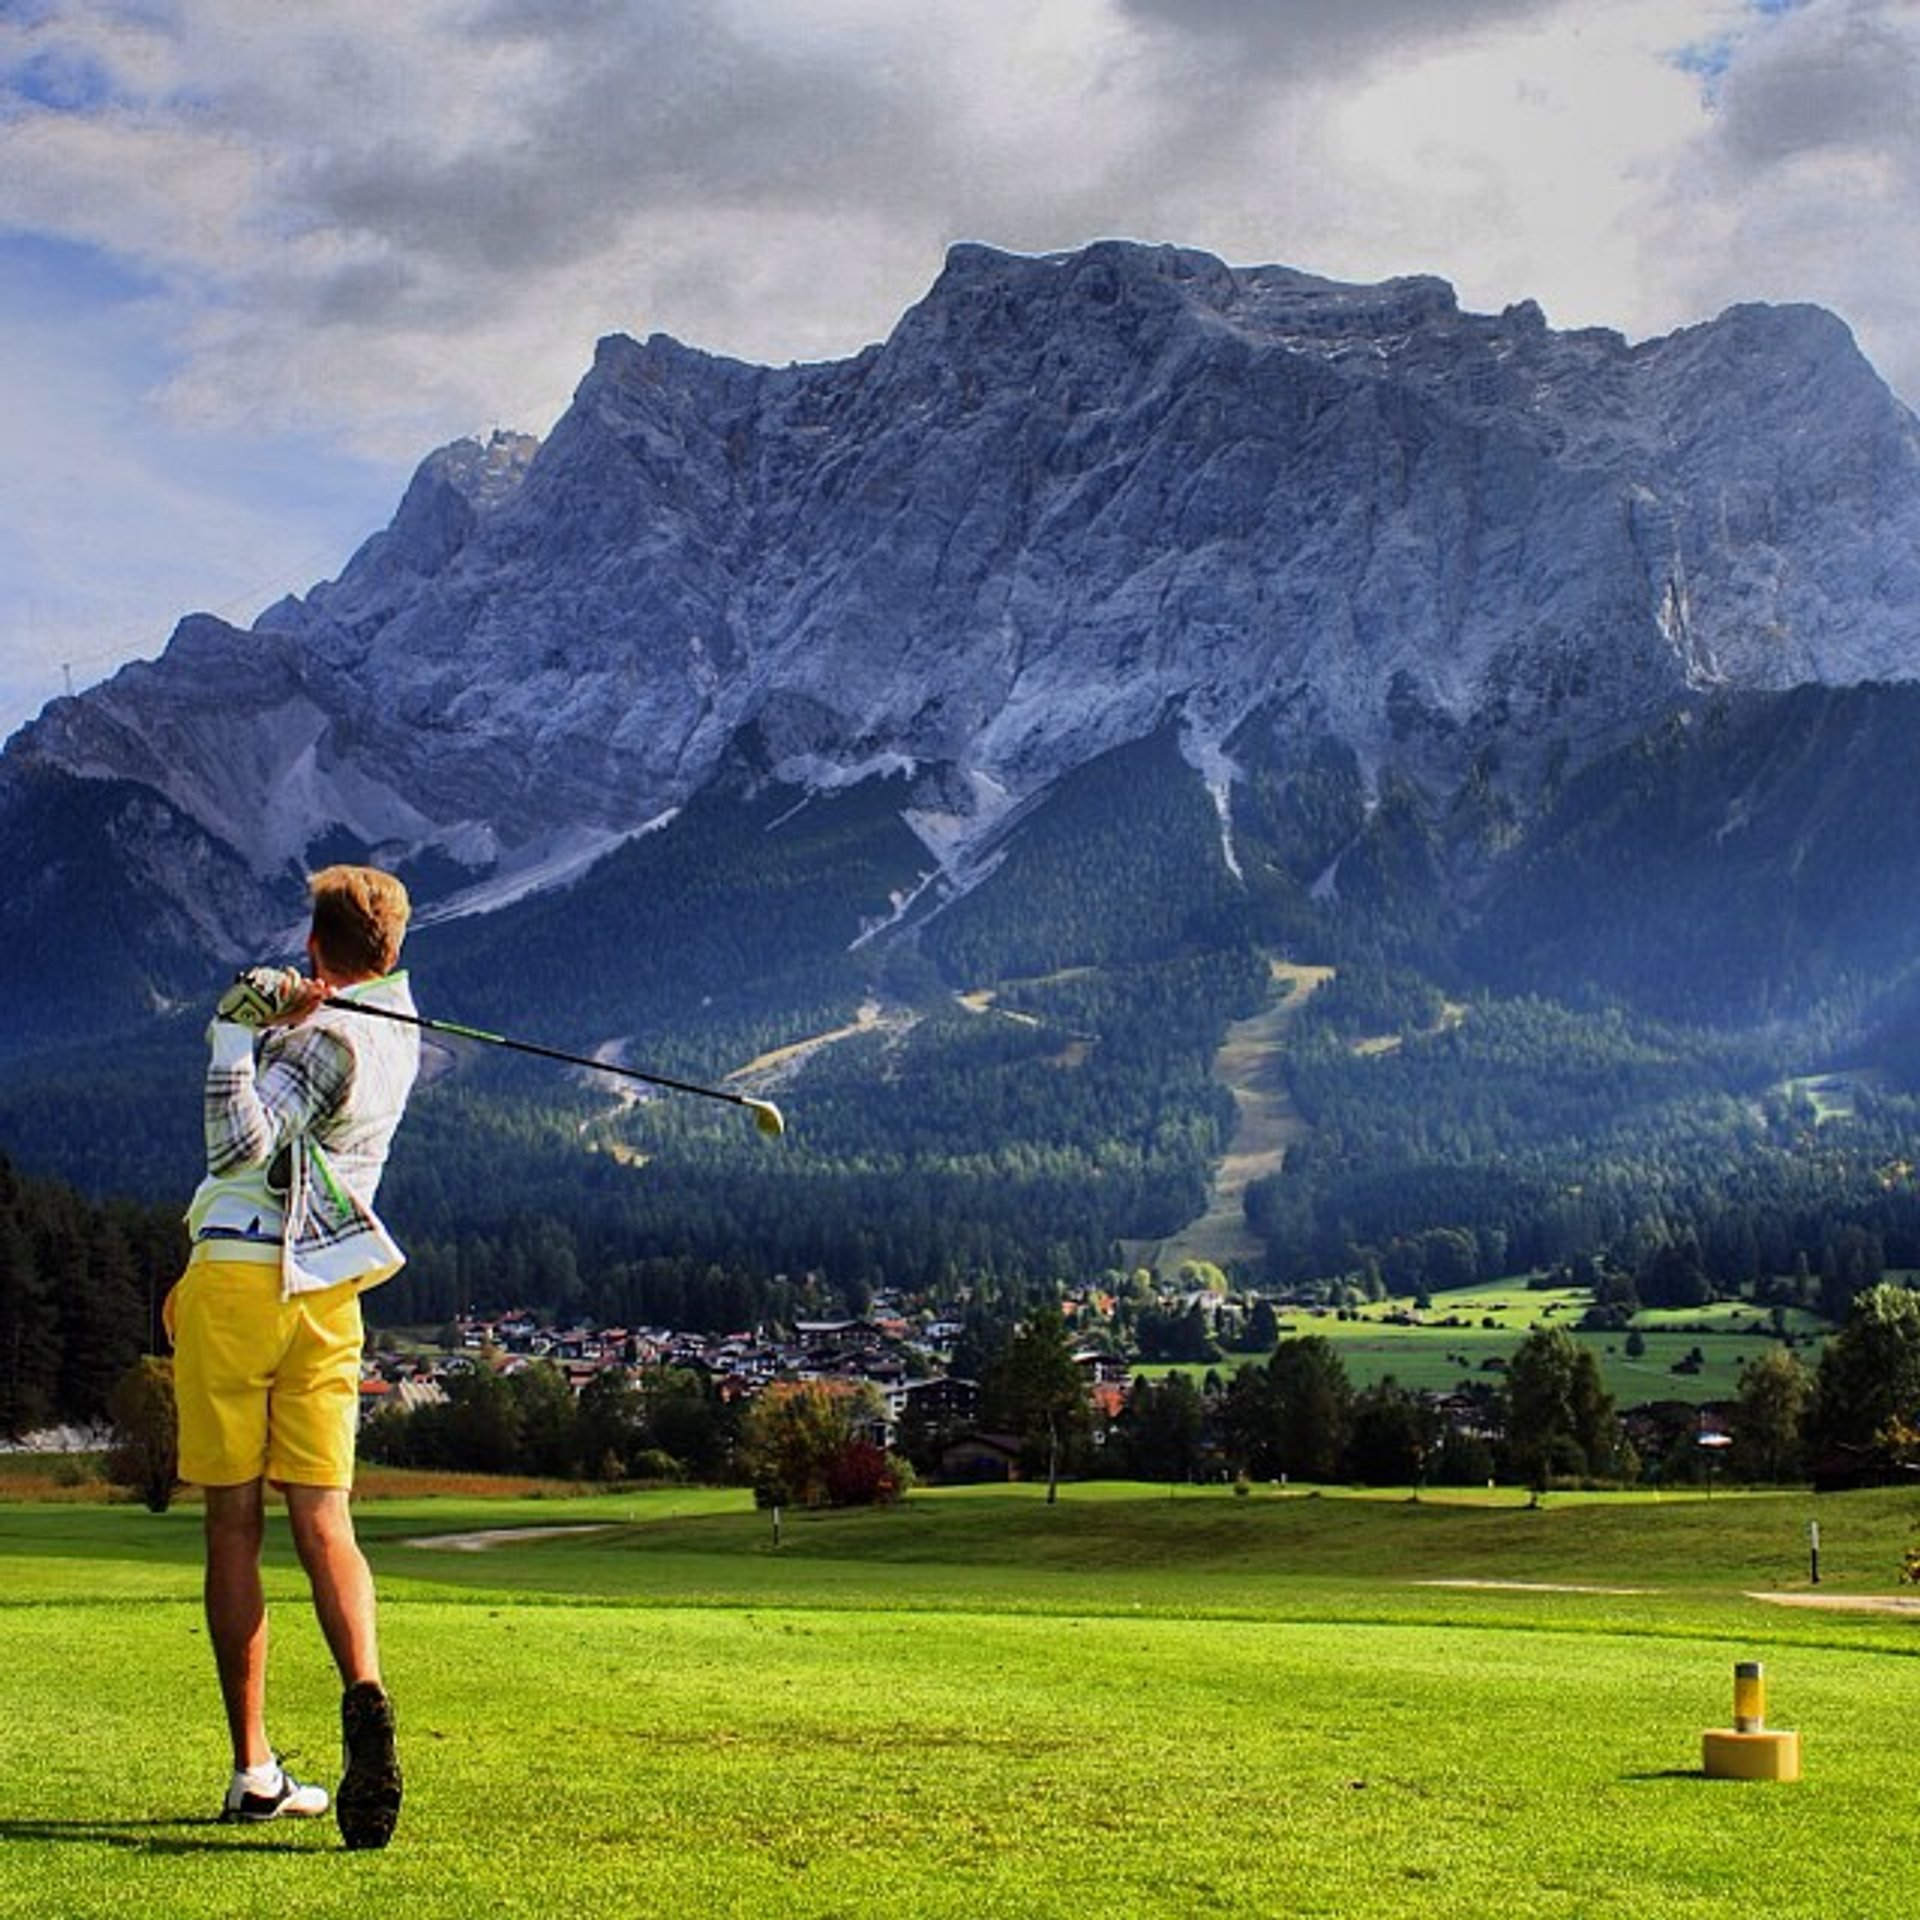 Alpine Golf in Austria 2019 - Best Time